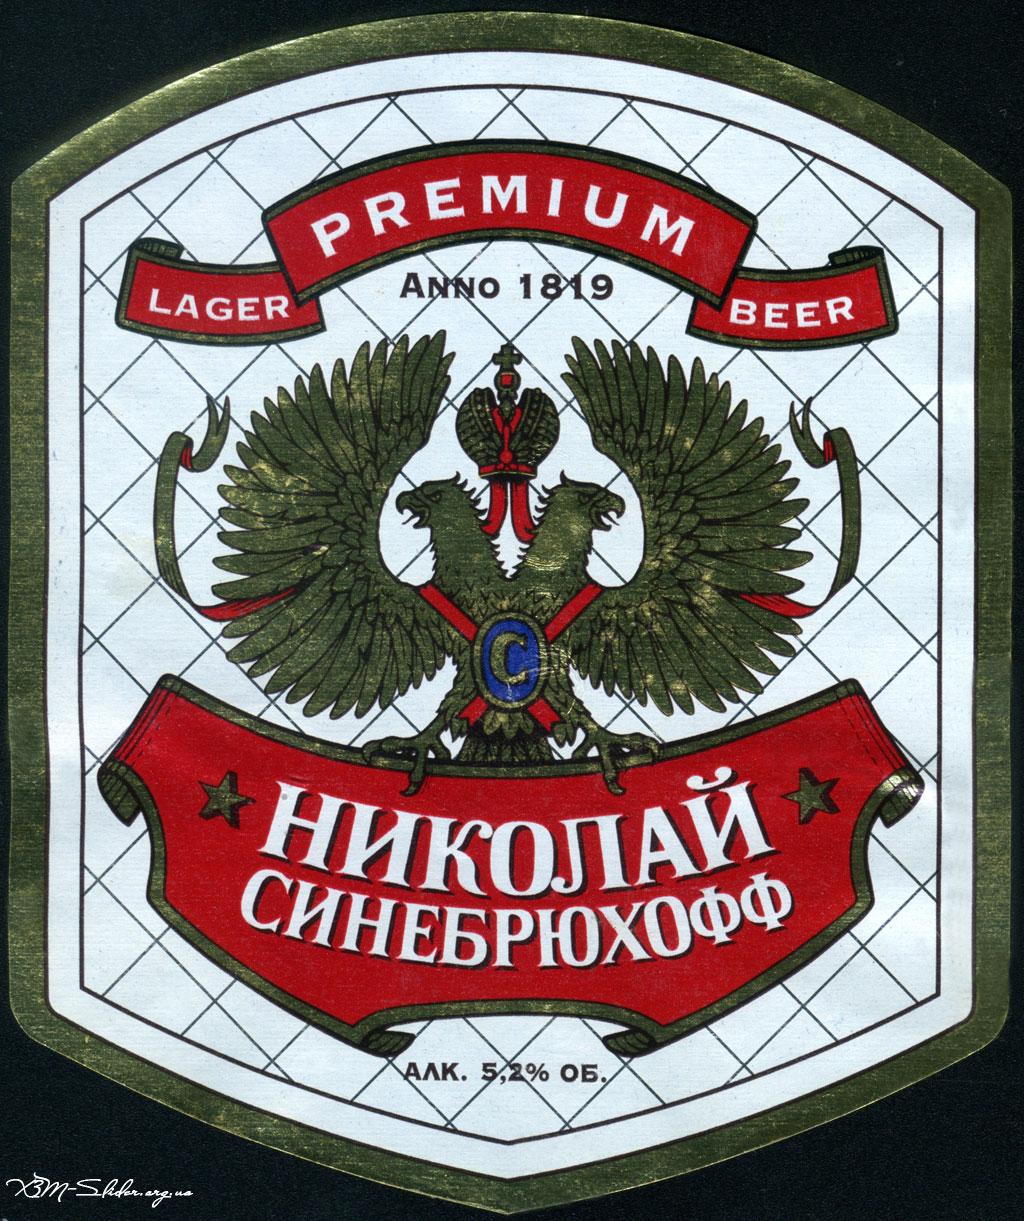 Николай Синебрюхофф - Lager Premium Beer